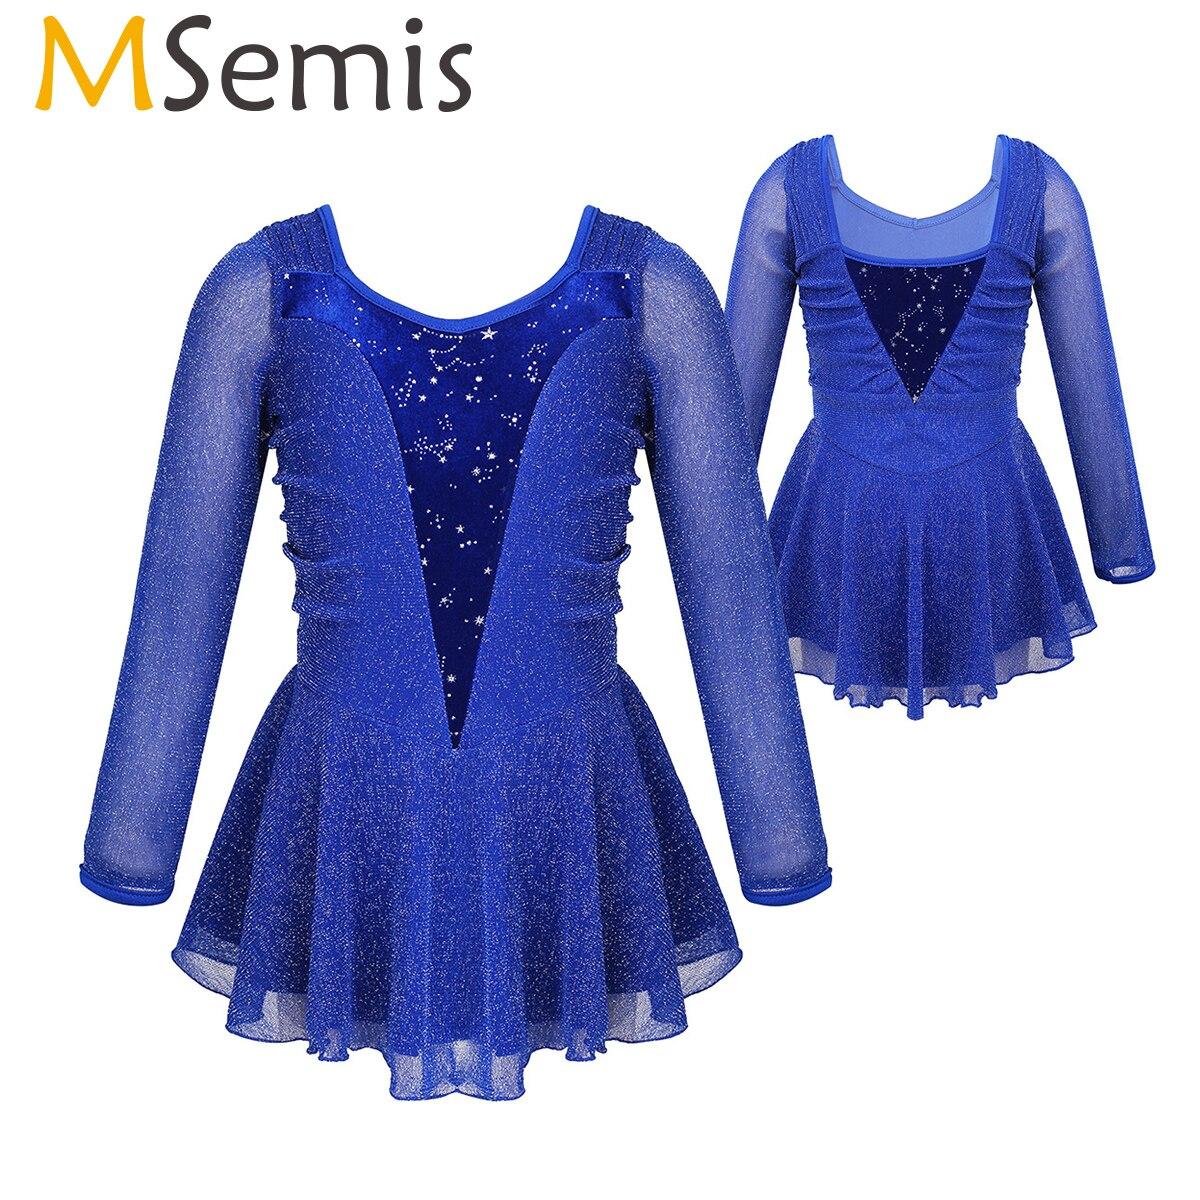 MSemis Girls Ice Skate Figure Skating Dress Kids Shiny Silver See Throug Velvet Ballet Rhythmic Gymnastics Leotard Dance Costume